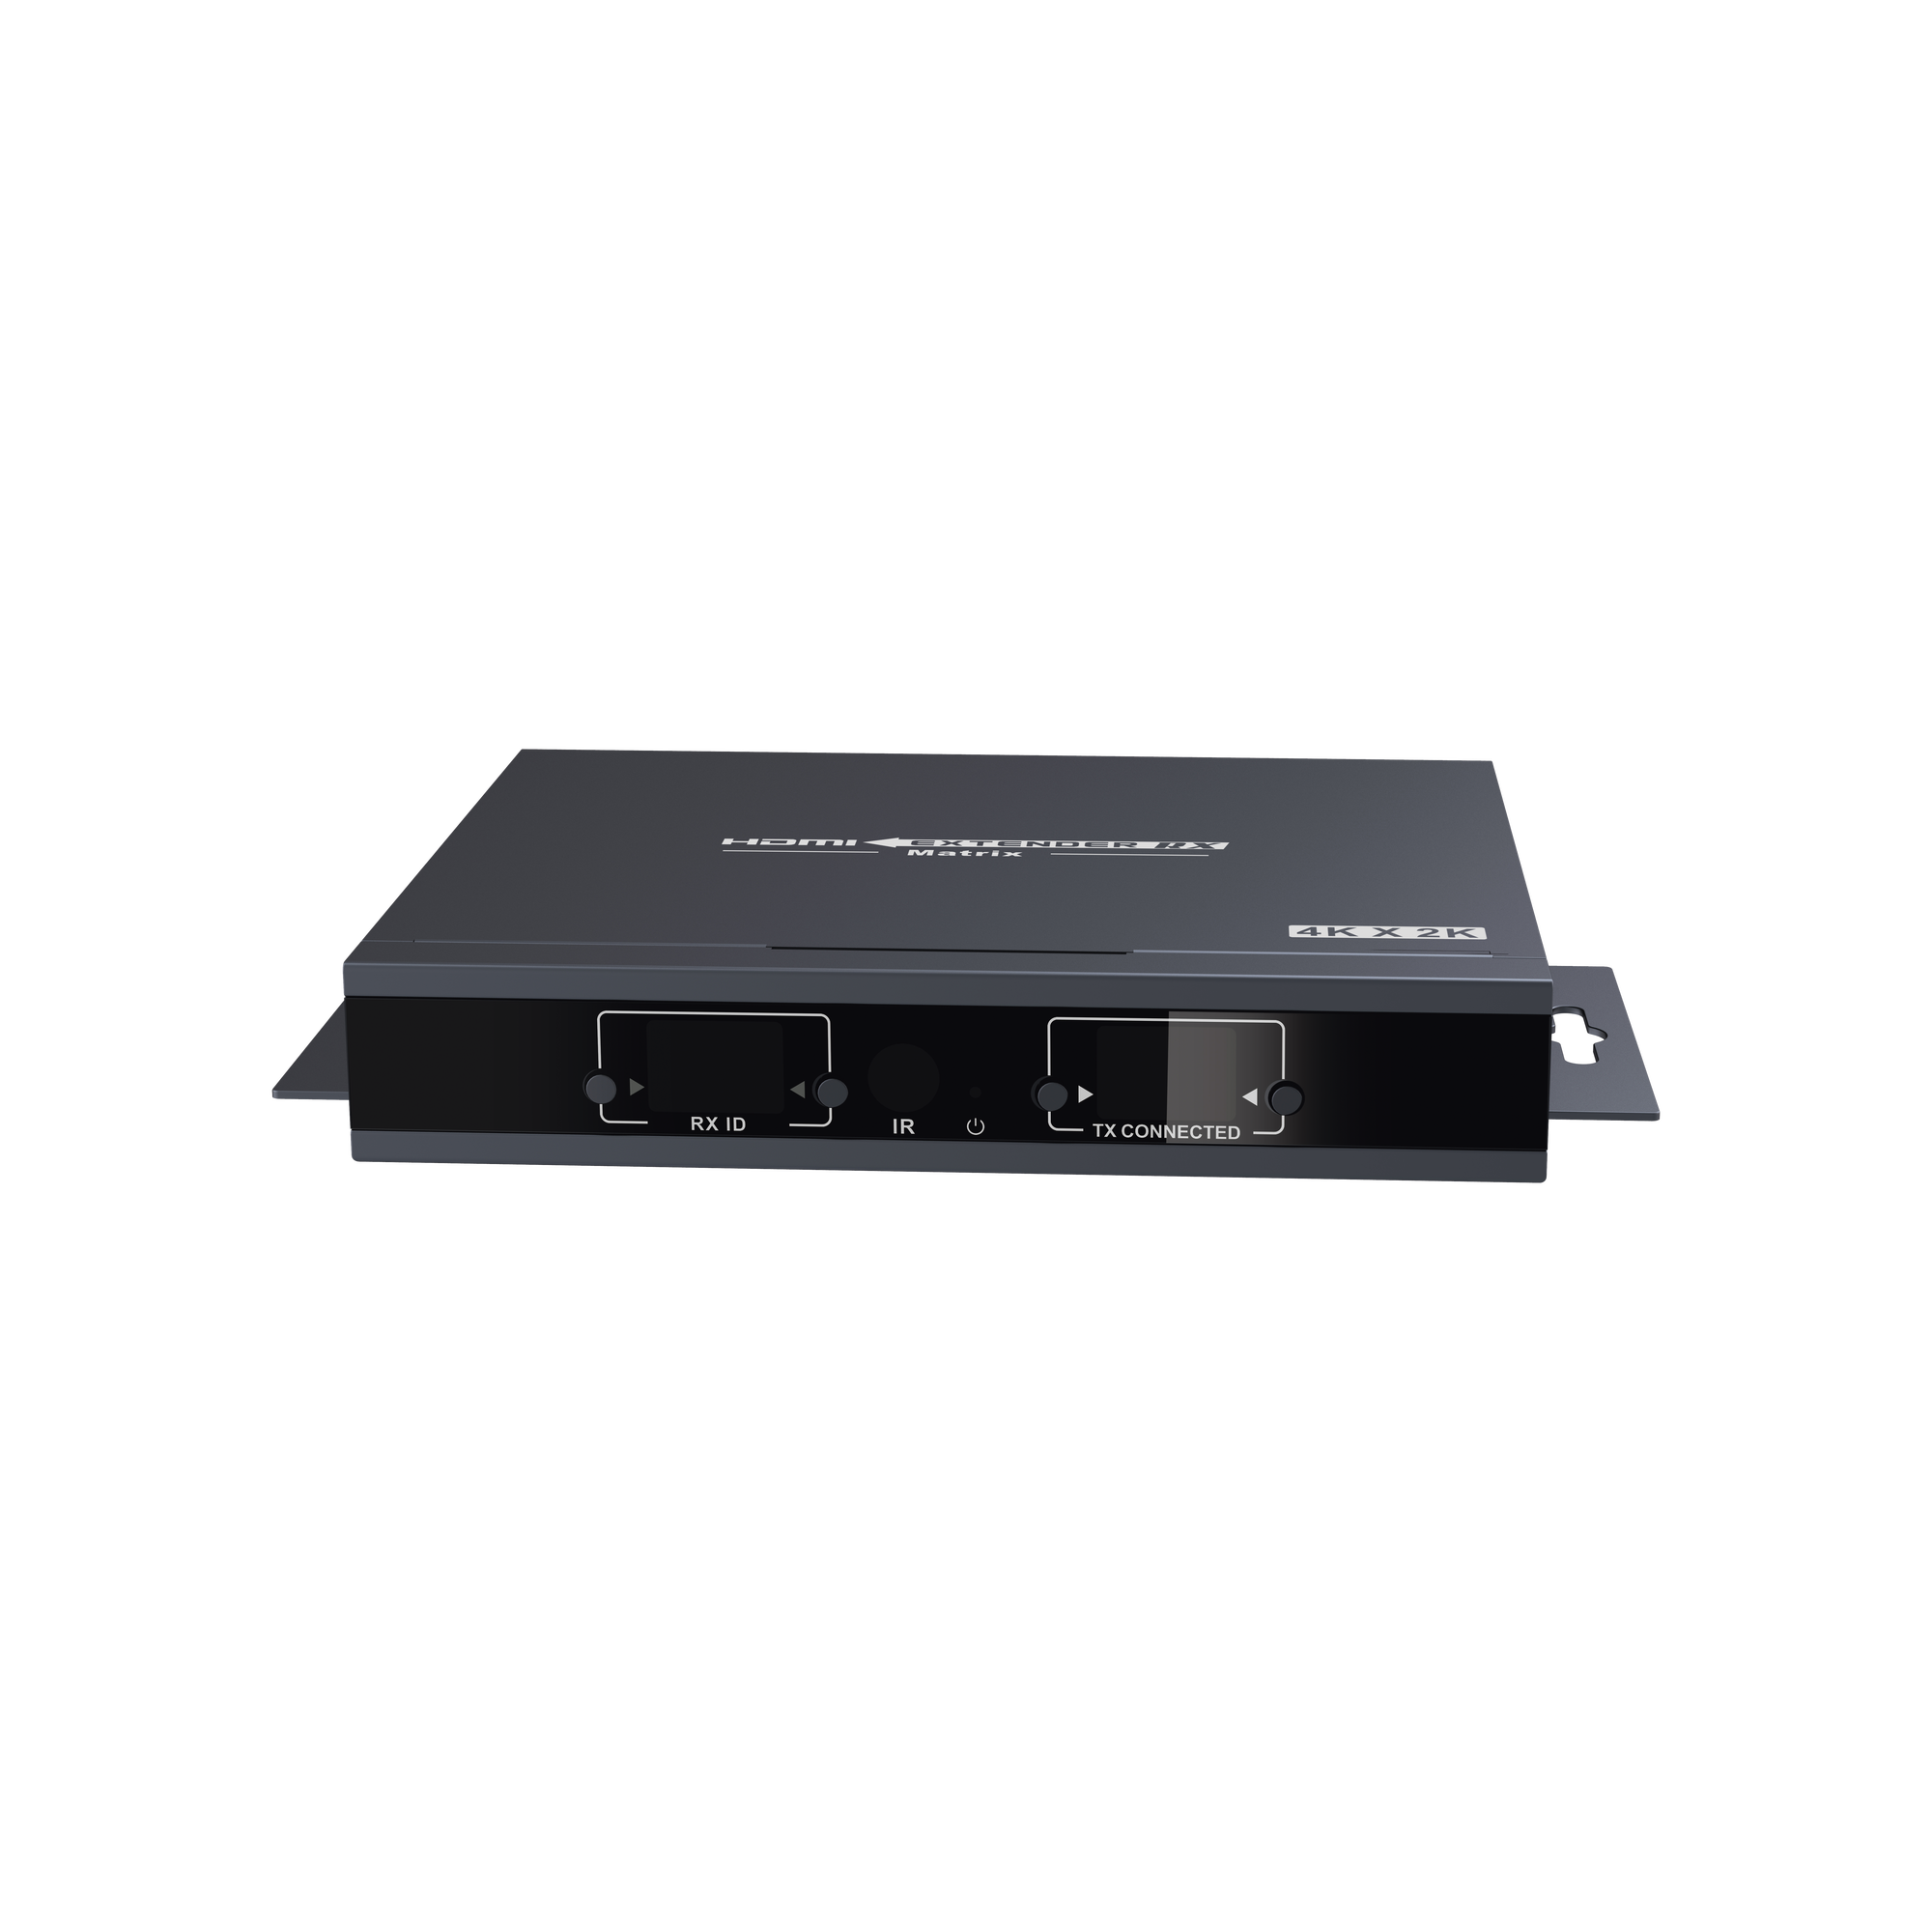 Receptor matricial para kit TT683MATRIX 4K x 2K @ 30 Hz sobre Cat5/6 a 120 /150 metros